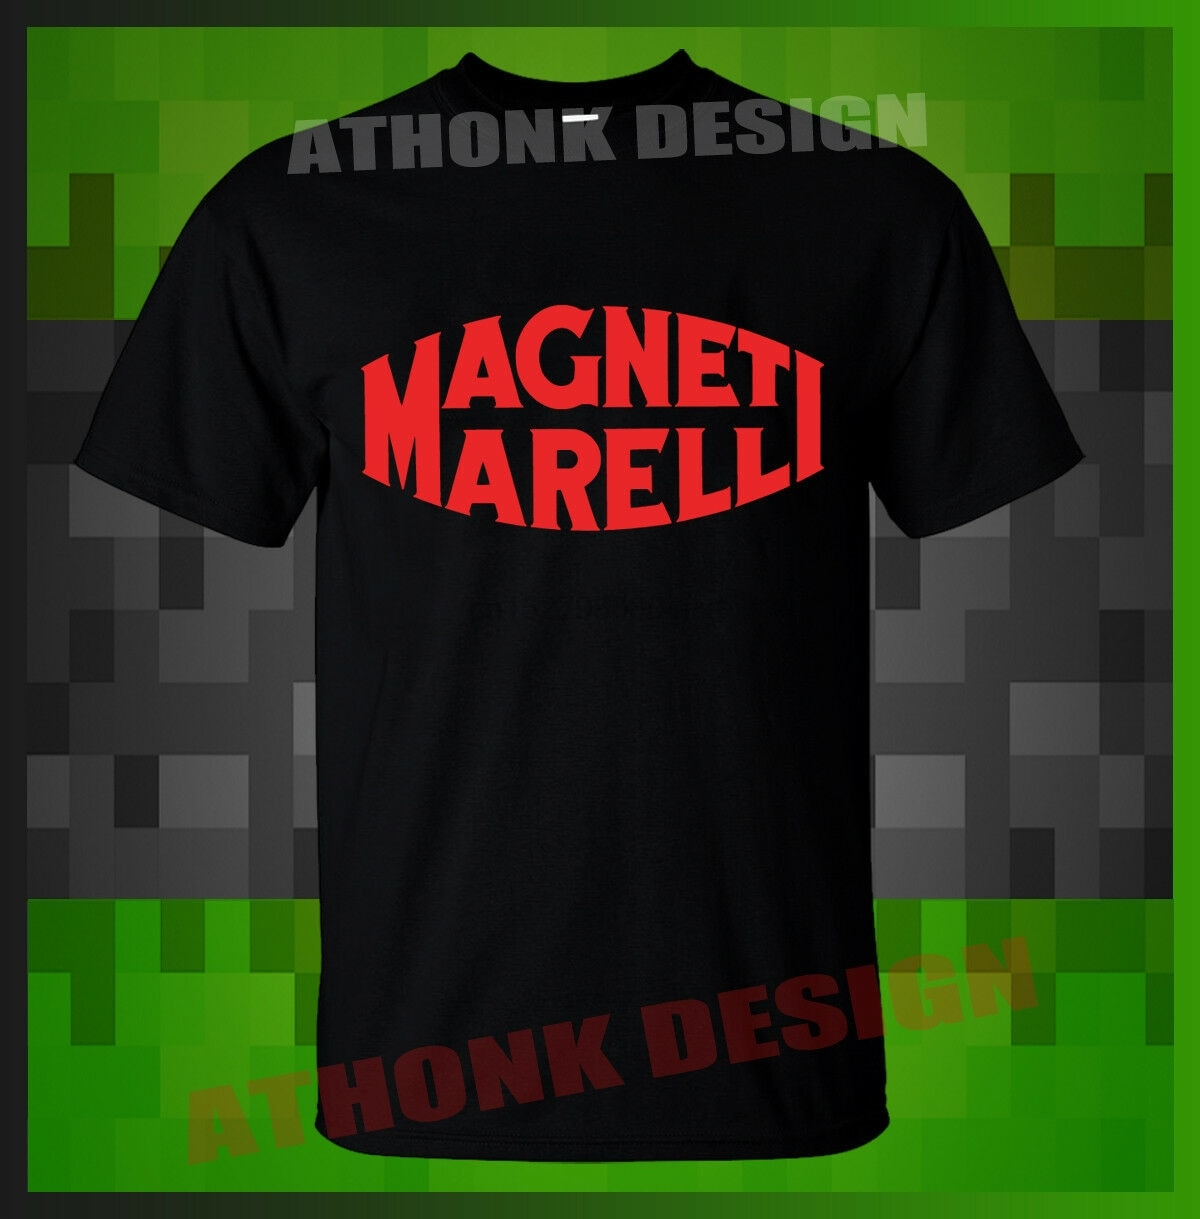 Camiseta nova de magneti marelli